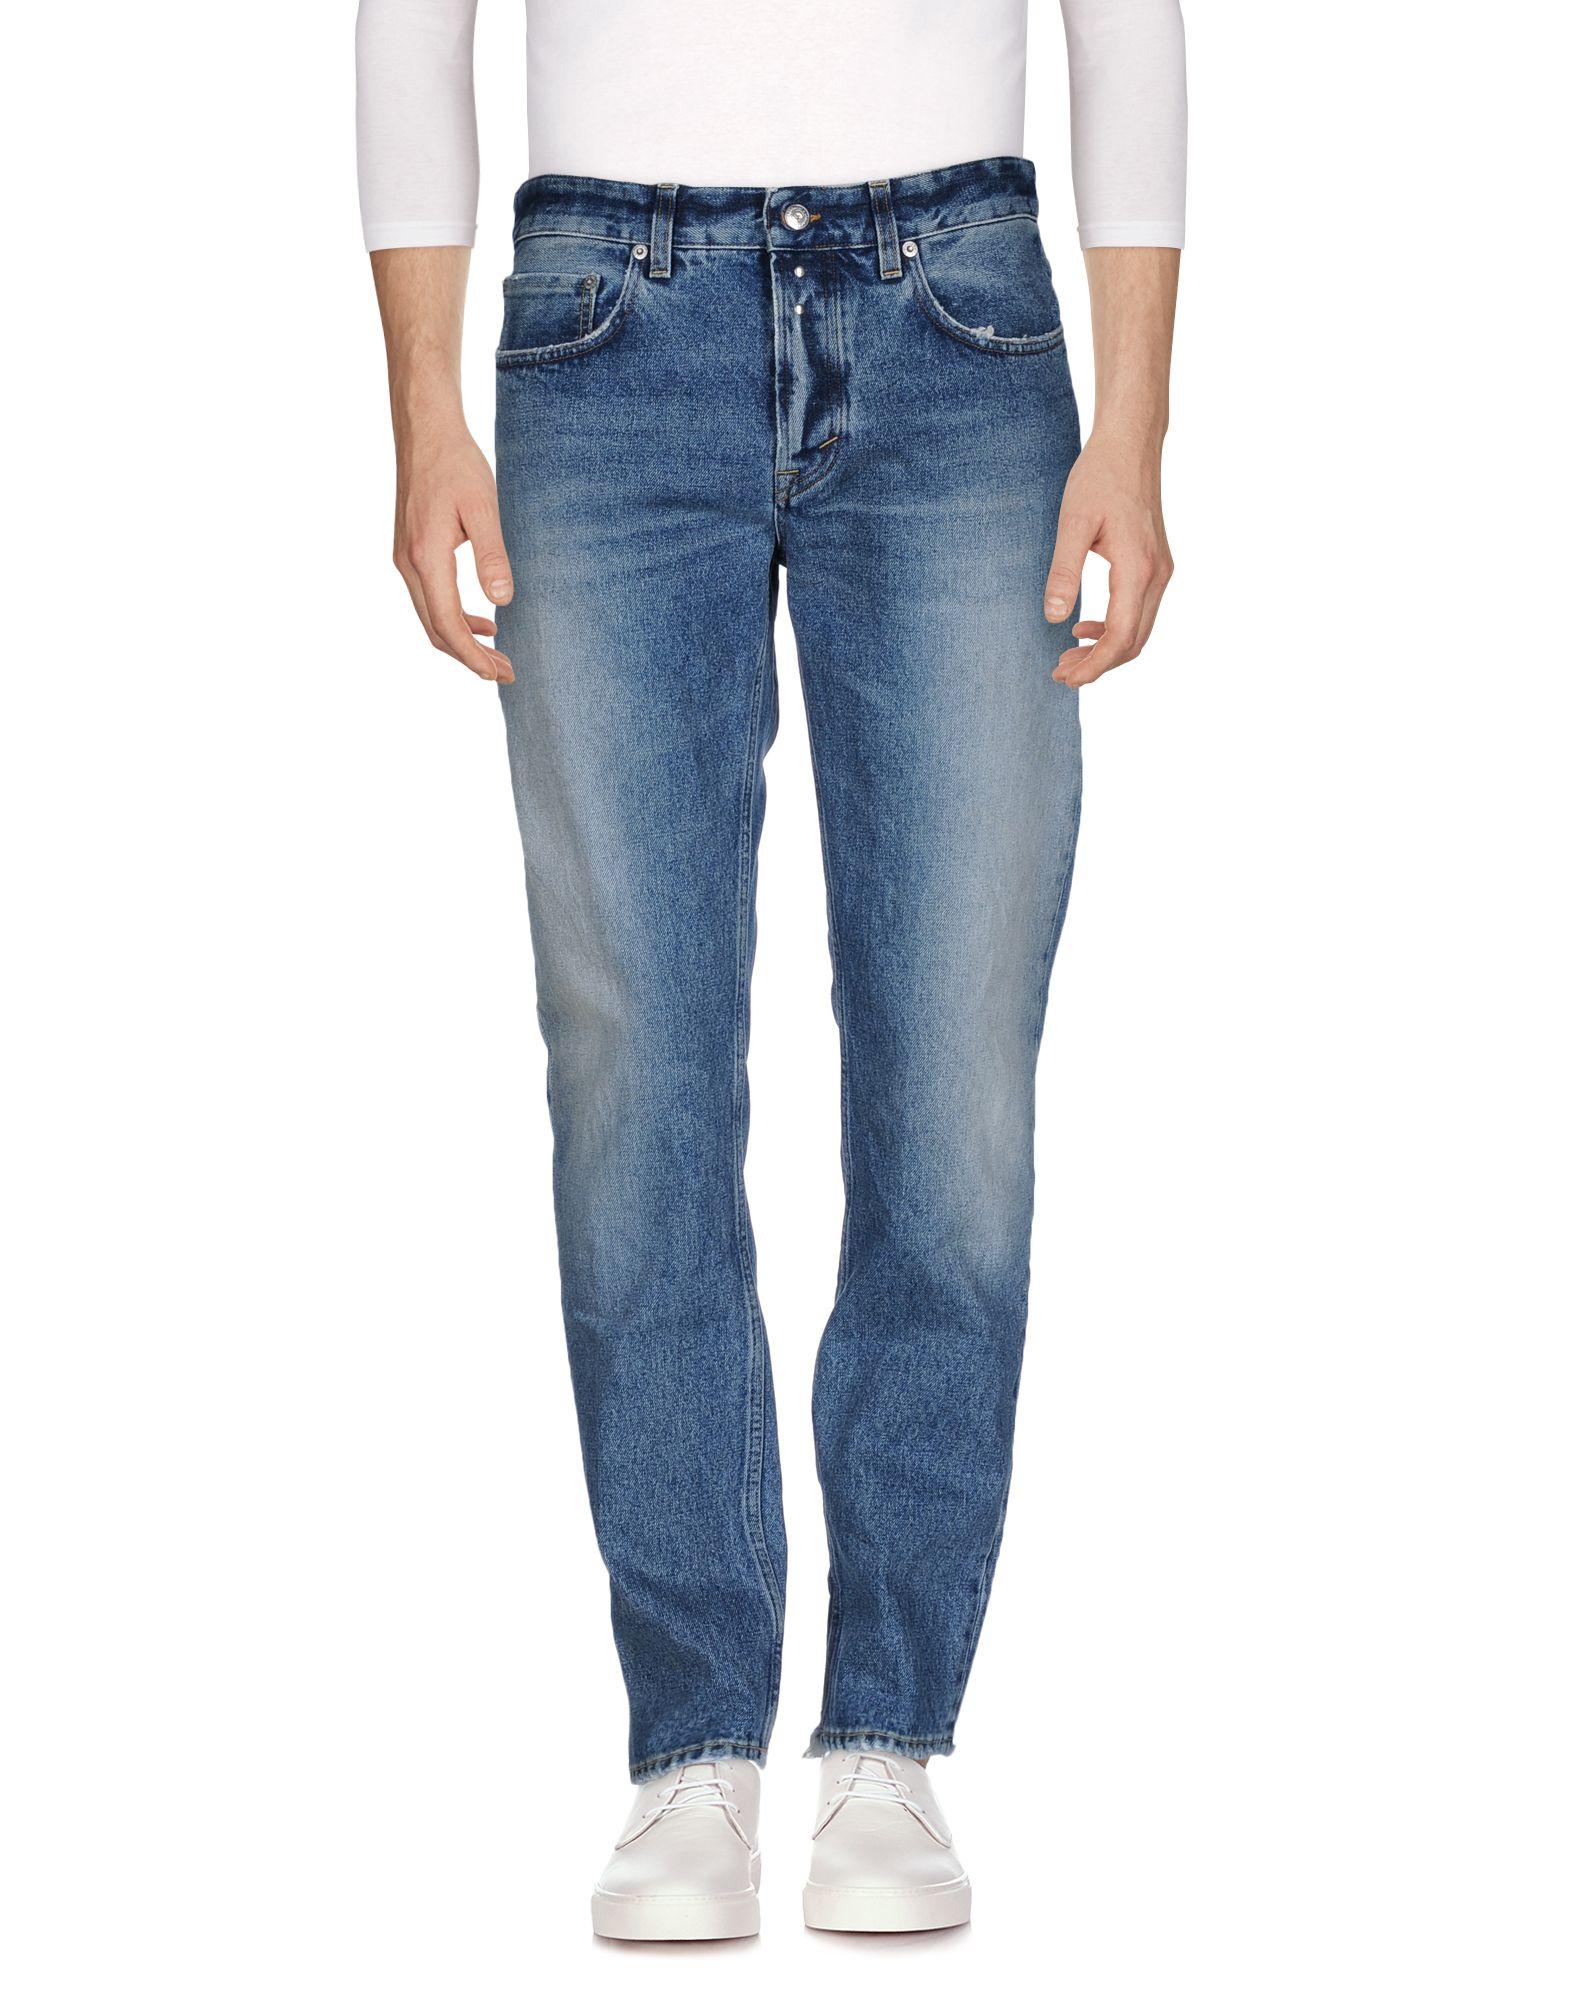 Pantaloni Jeans Department 5 Donna - Acquista online su